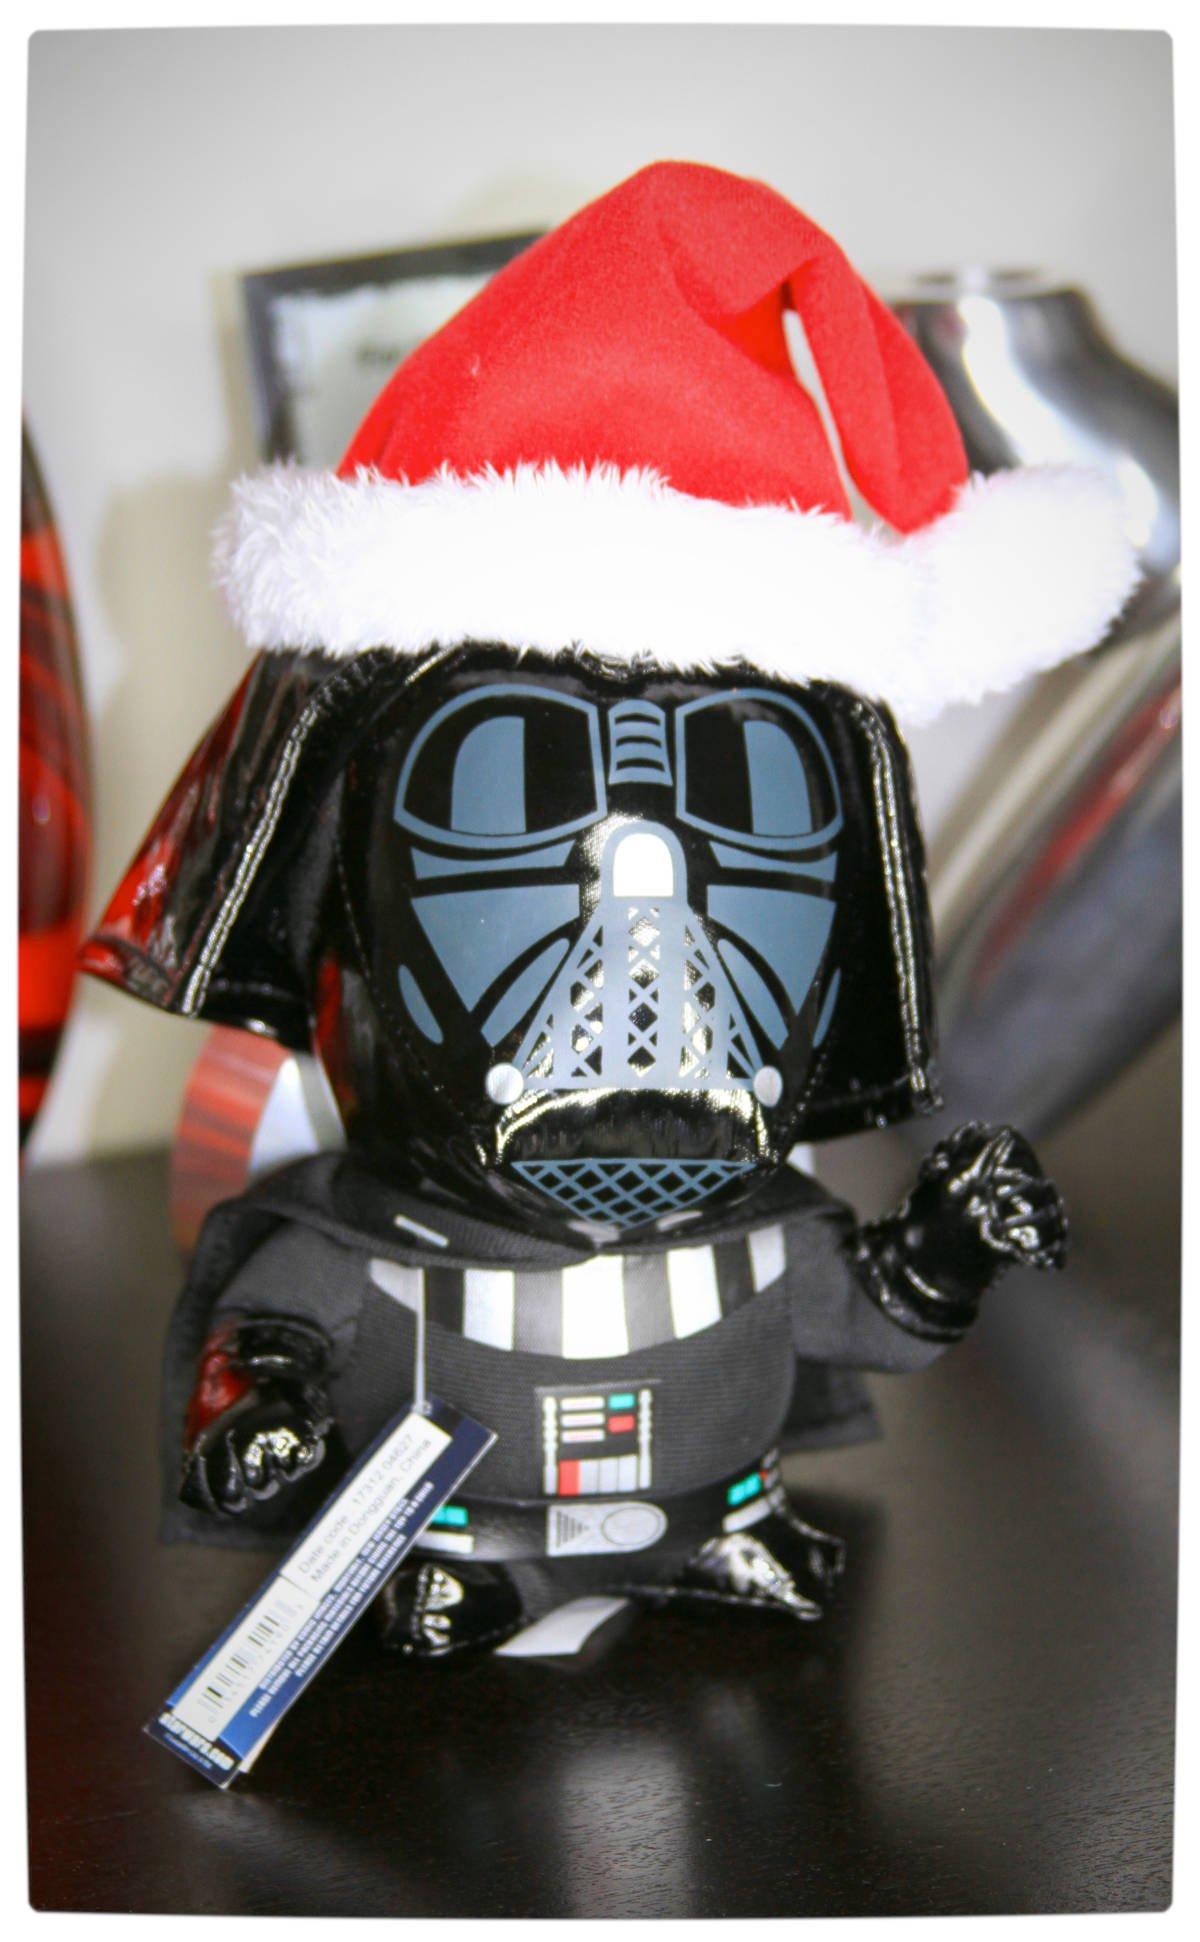 Vamers - Win With Vamers - Christmas Plushies - Star Wars Darth Vader Christmas Plush